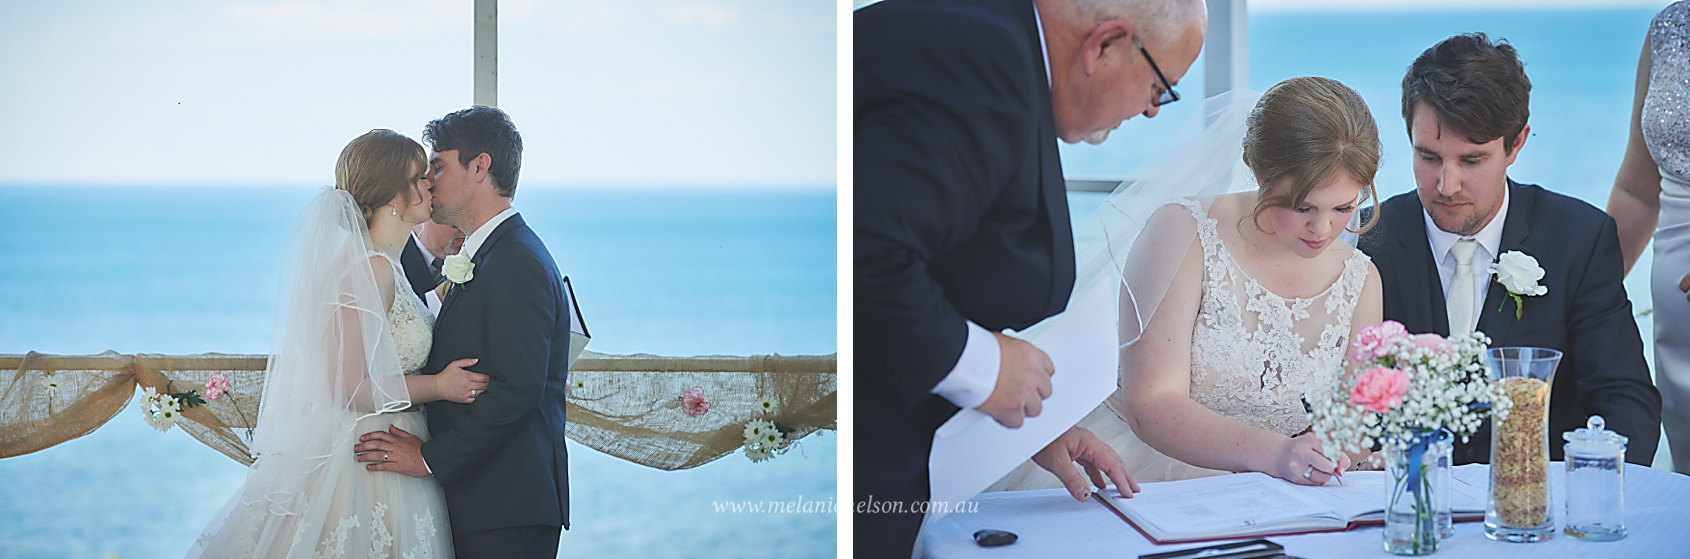 yorke_peninsula_wedding_photographer_0042.jpg